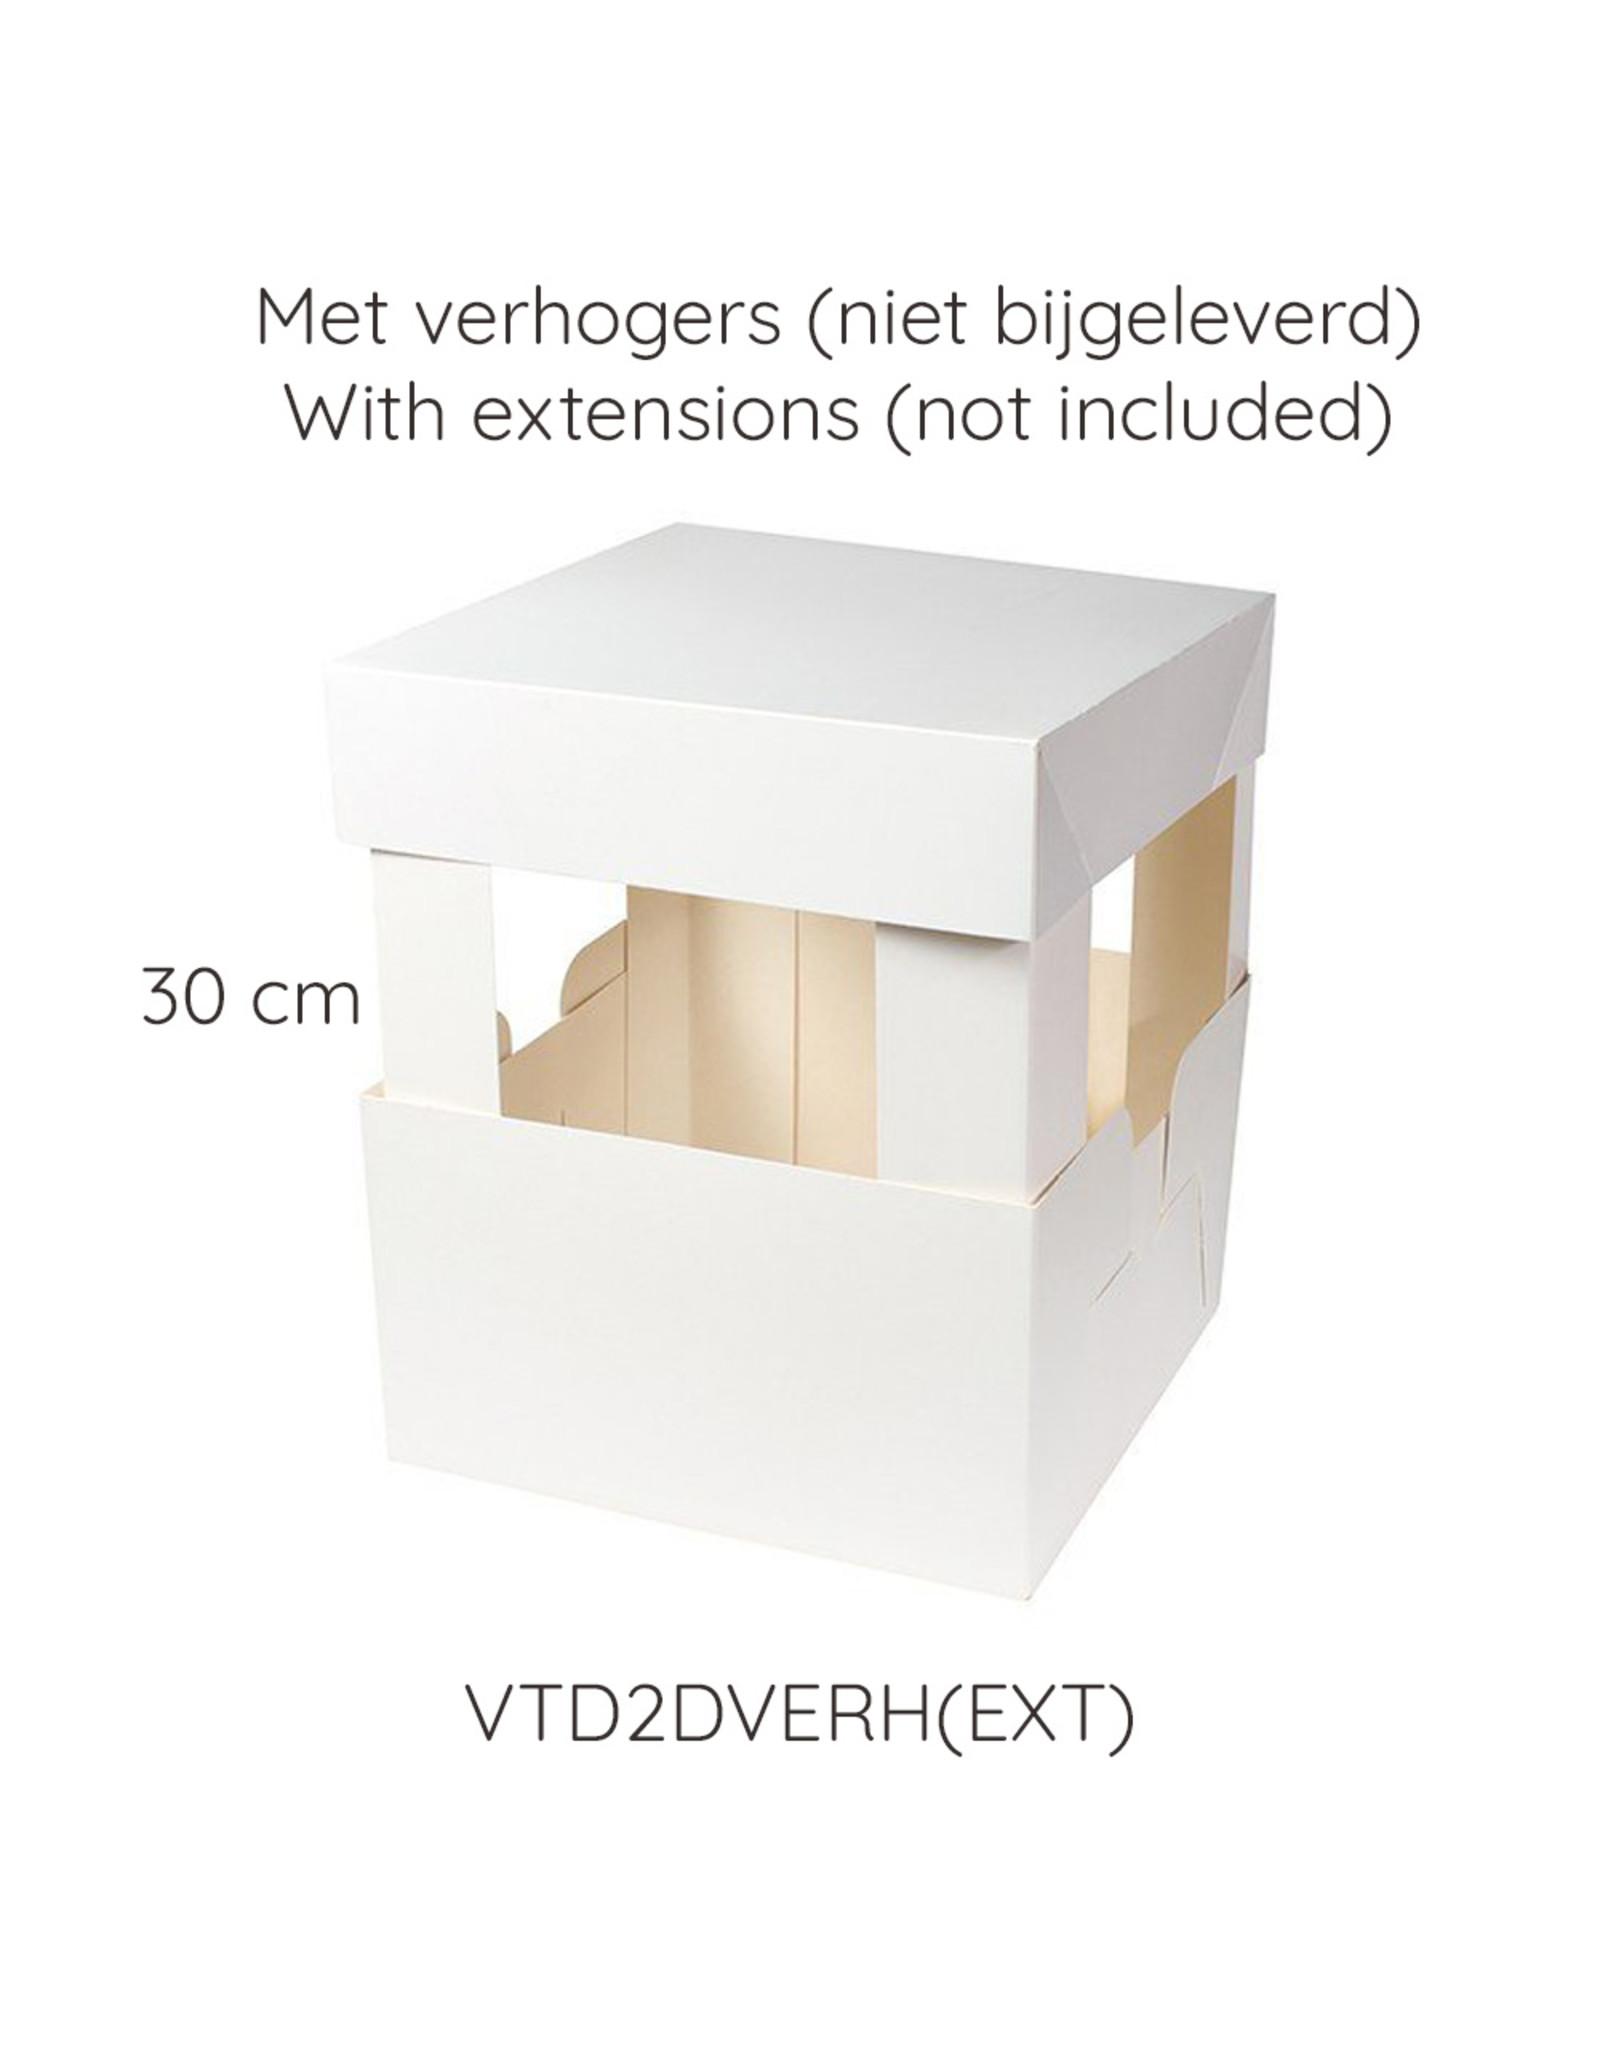 Folding 2 piece cakebox - 23 x 23 x 15 cm (50 pieces)